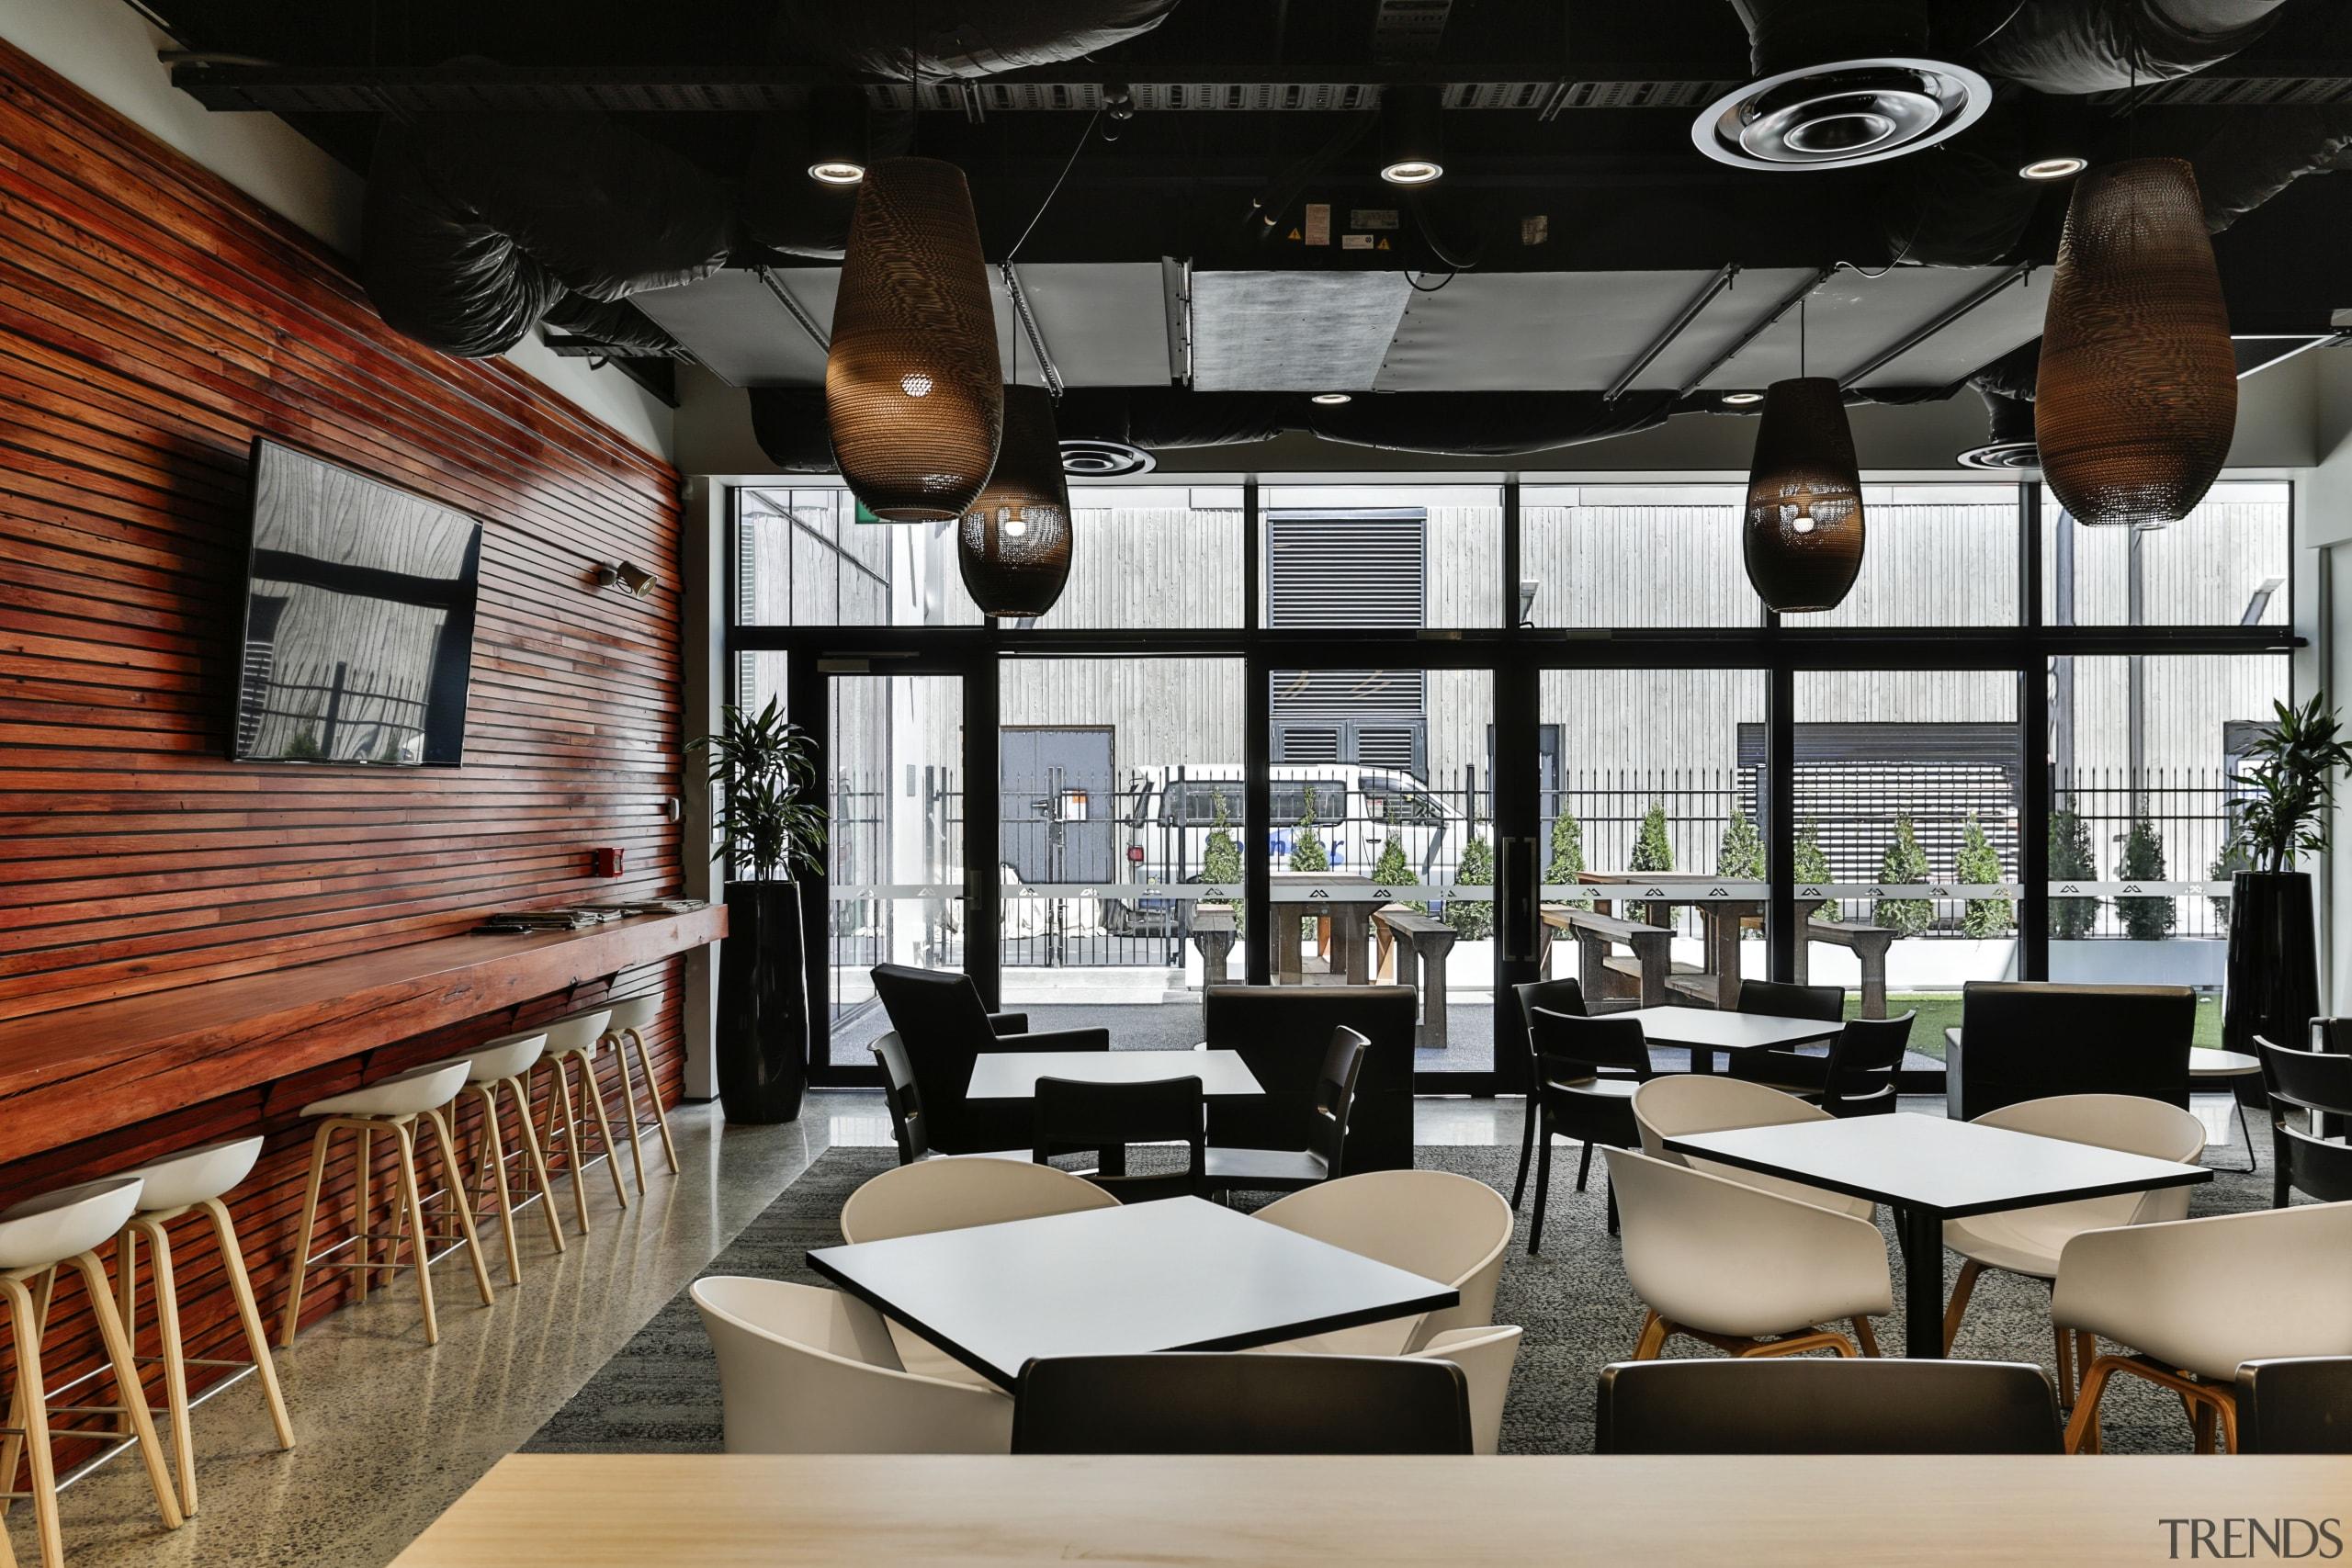 The cafeteria at the Kathmandu headquarters features recycled café, furniture, interior design, restaurant, black